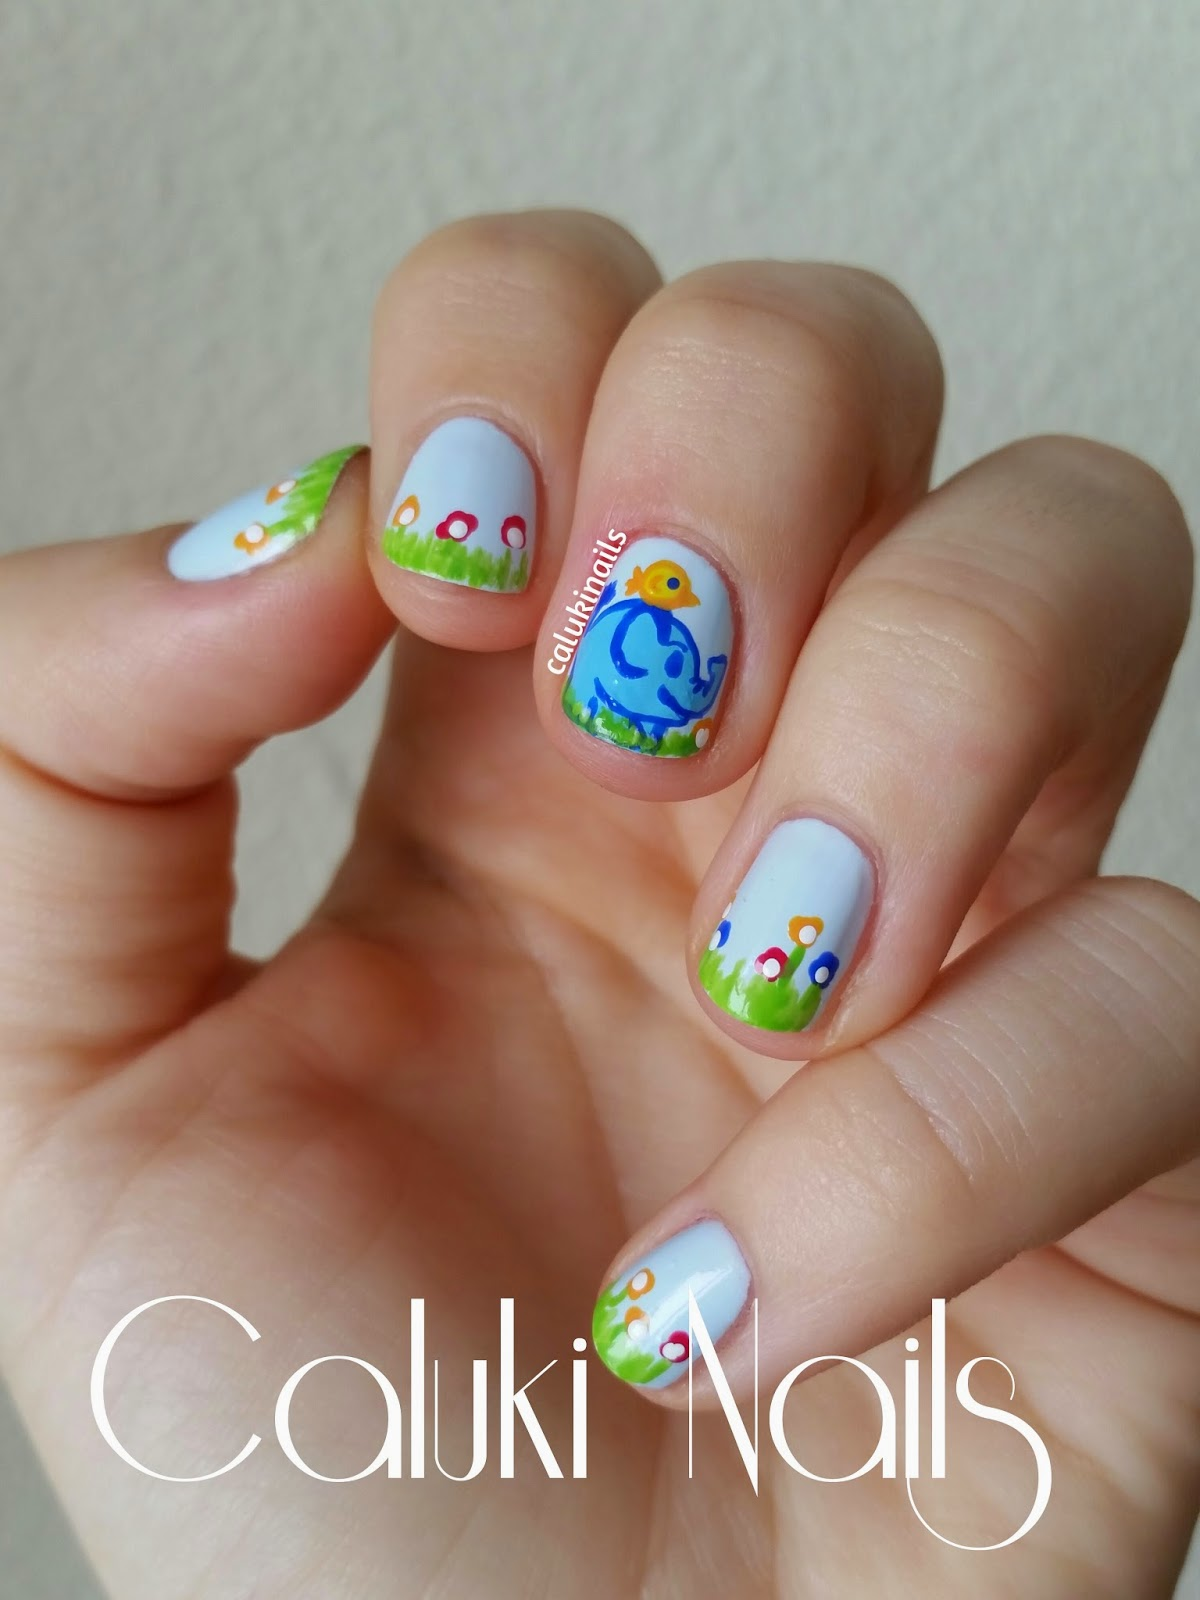 Caluki Nails : Nail art Elefante